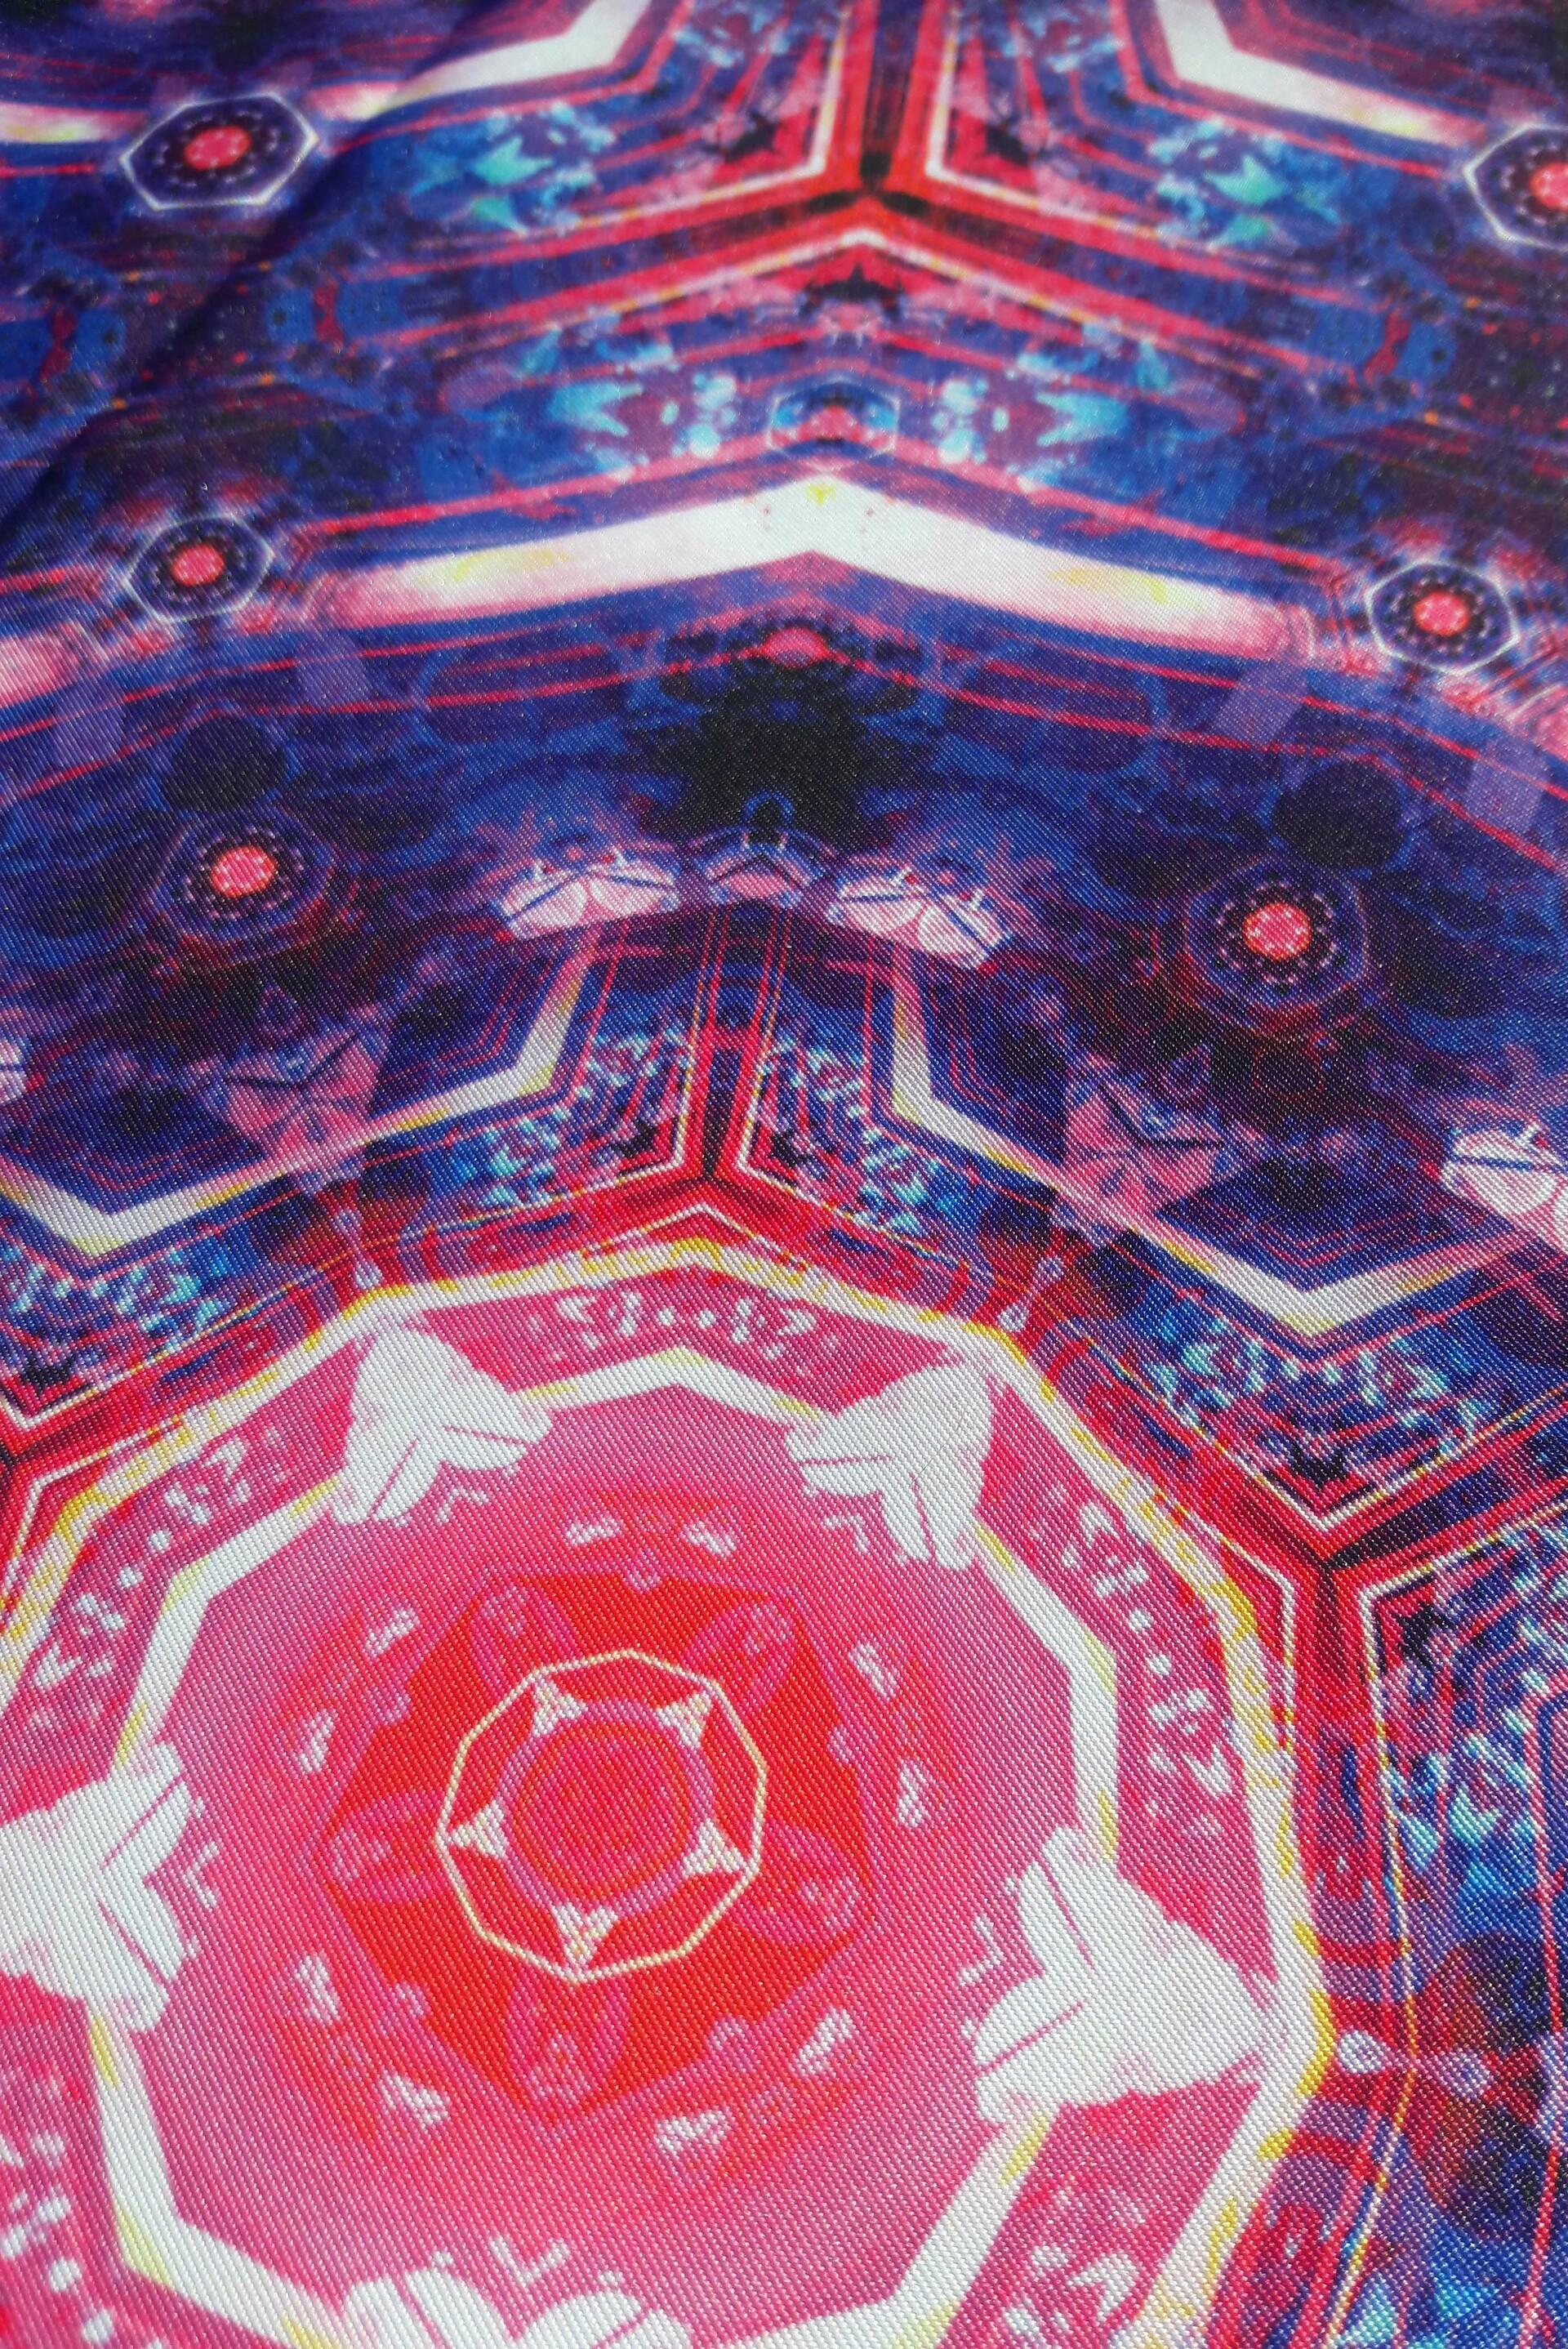 Natural warp oath of the jewel box tapestry medium detail 02